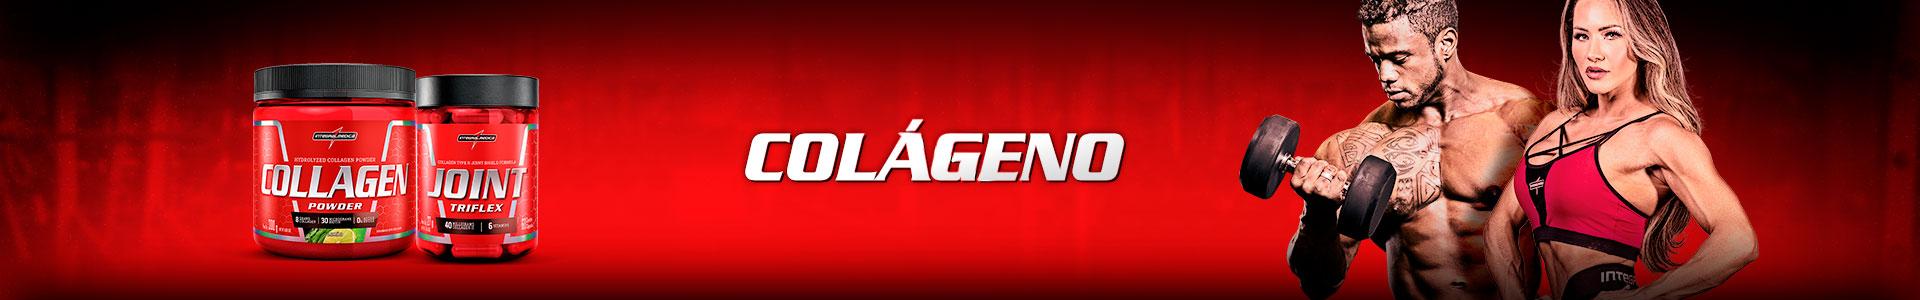 Banner - Colágeno - Desktop